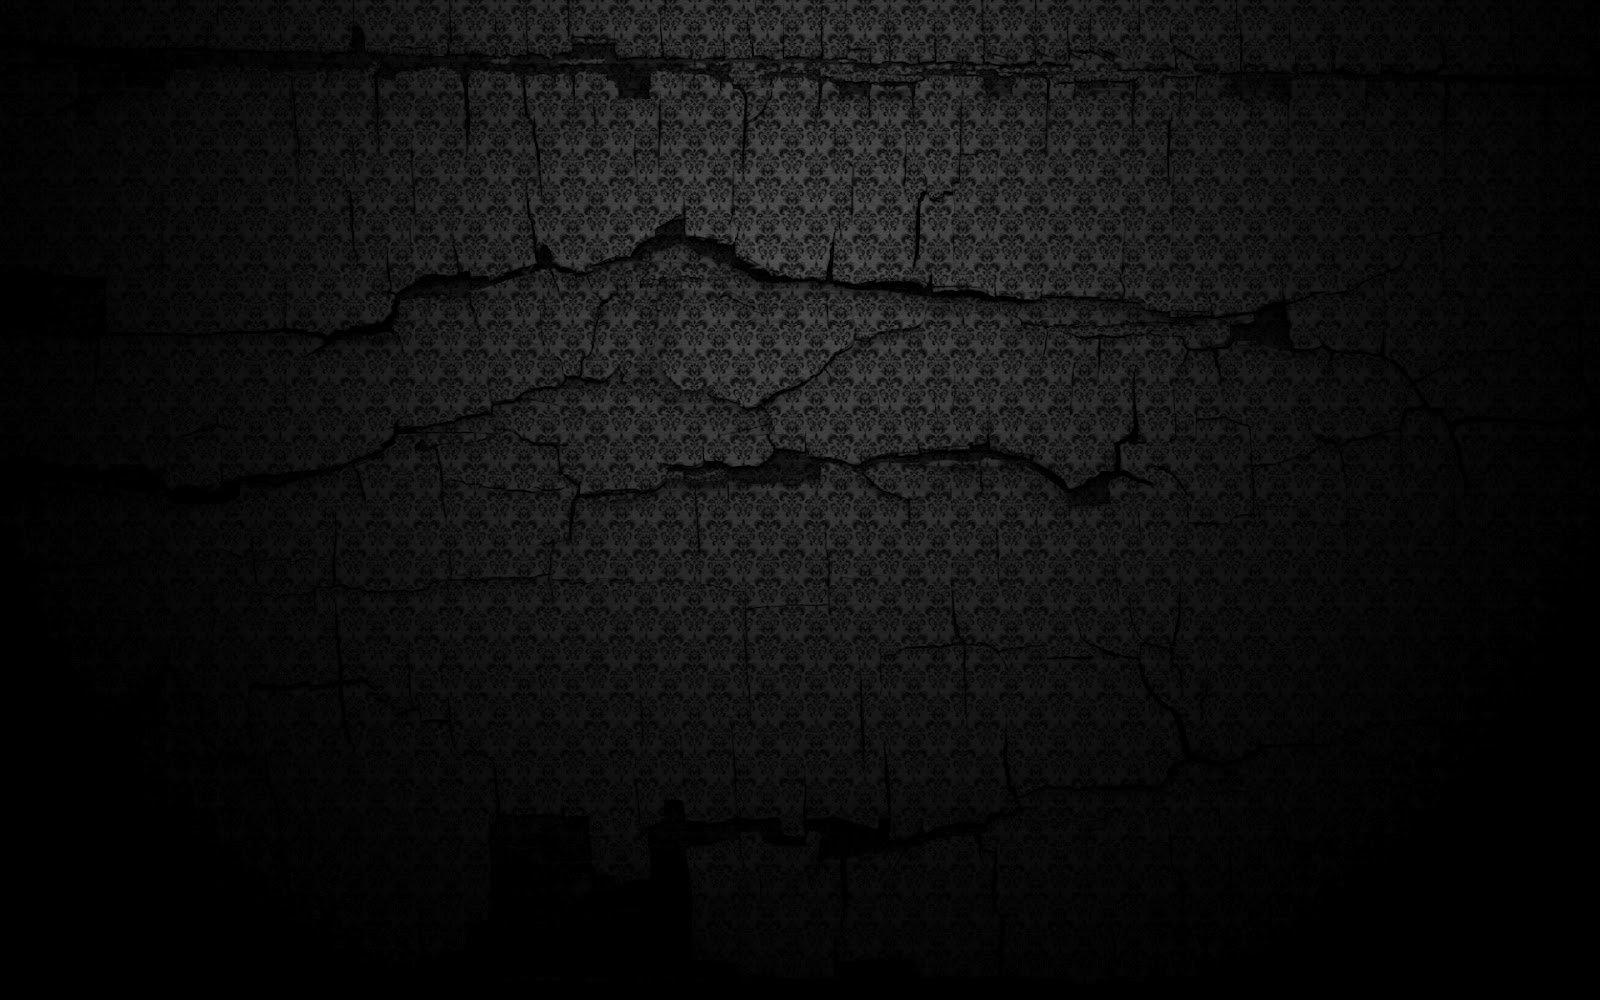 Black wallpaper hd wallpapersafari - Dark background wallpaper hd ...